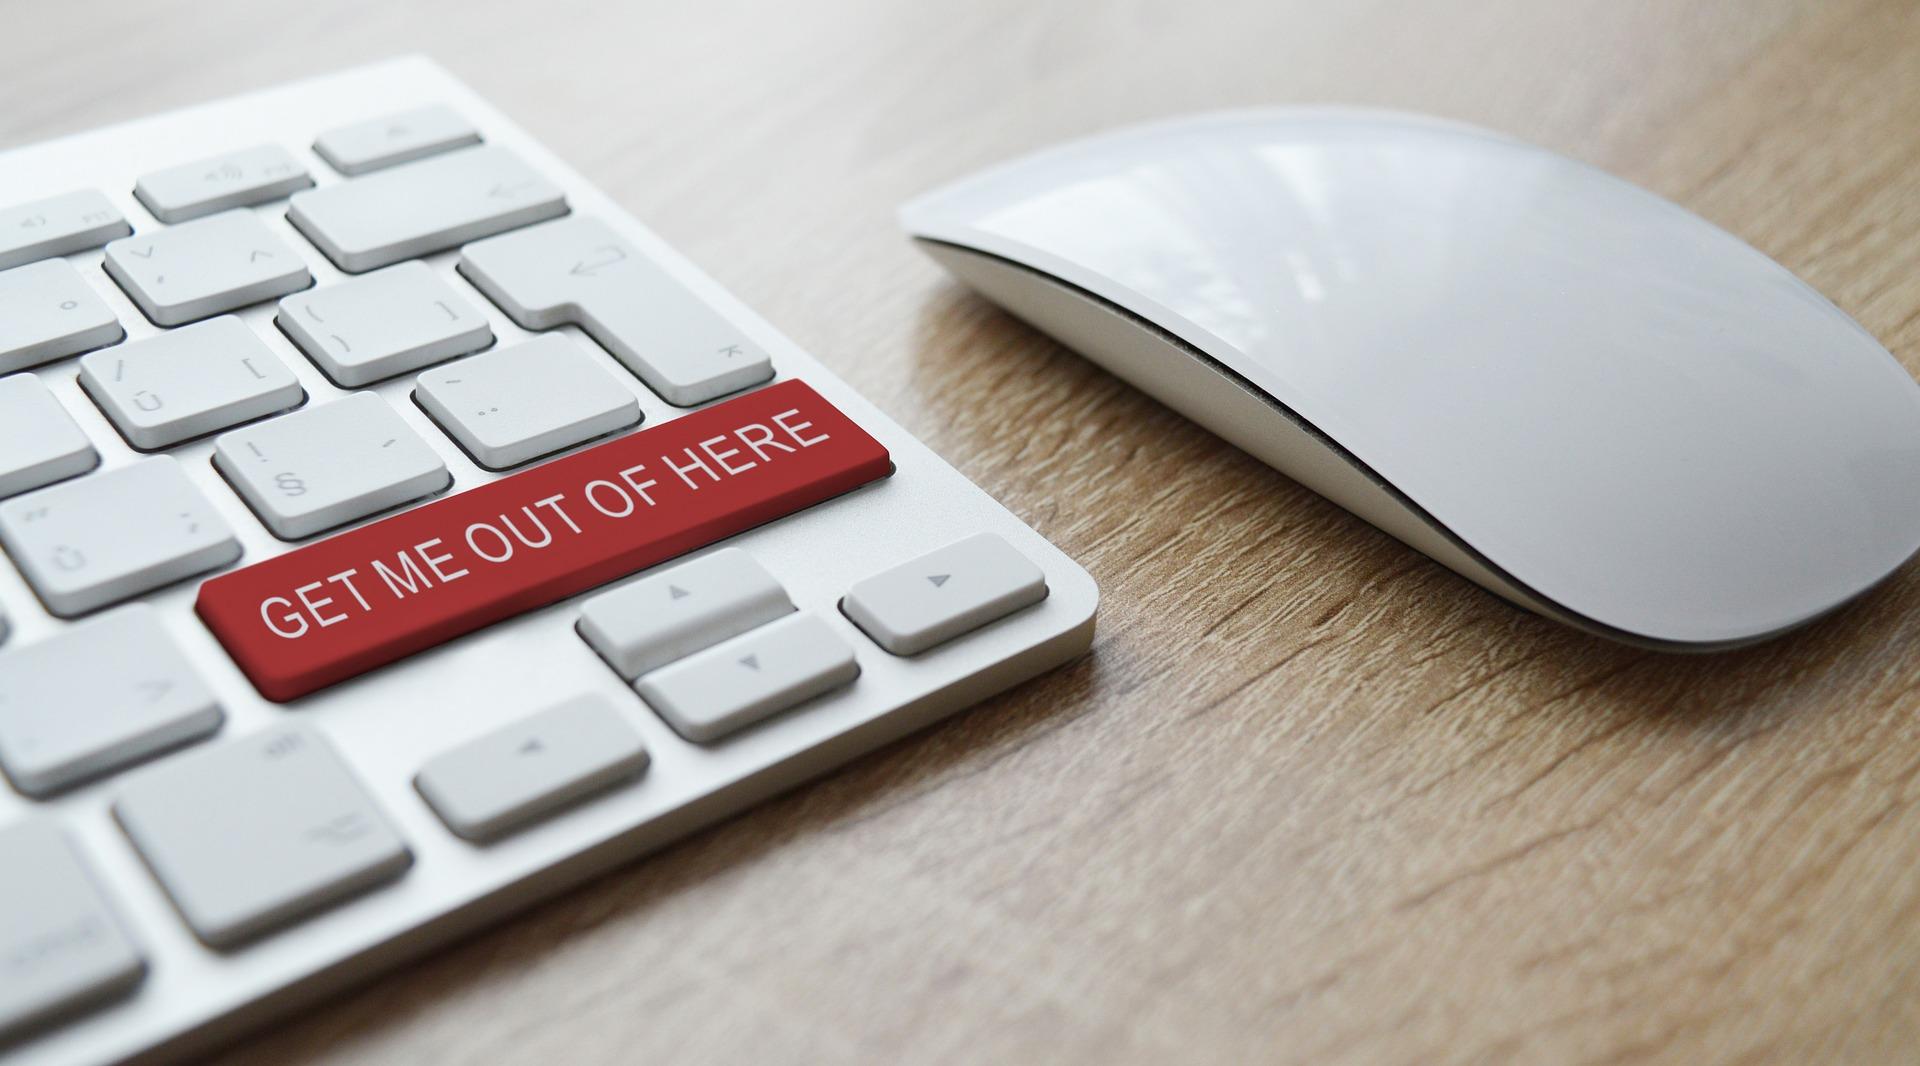 Costco $125 Voucher Scam on Social Media Websites  Free Groceries